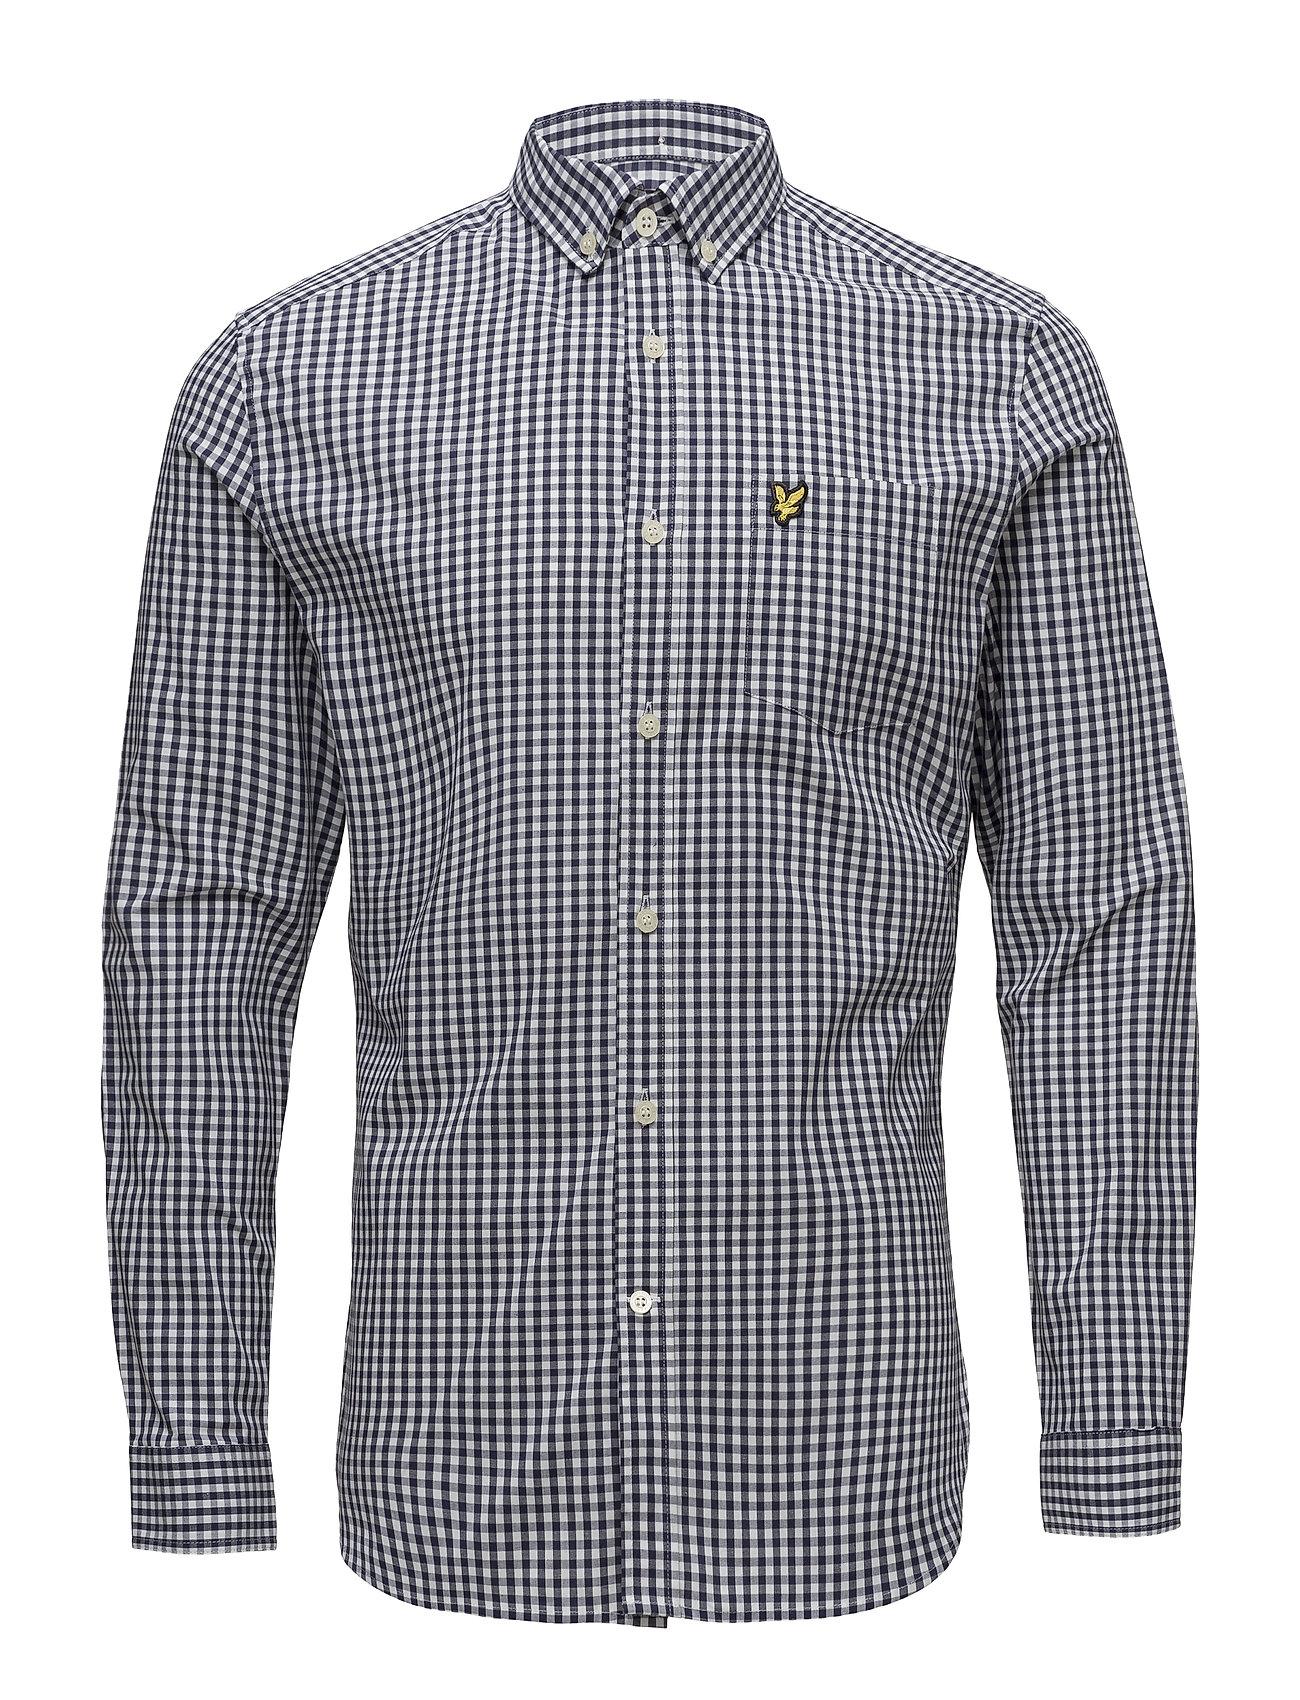 Lyle & Scott LS Slim Fit Gingham Shirt - NAVY